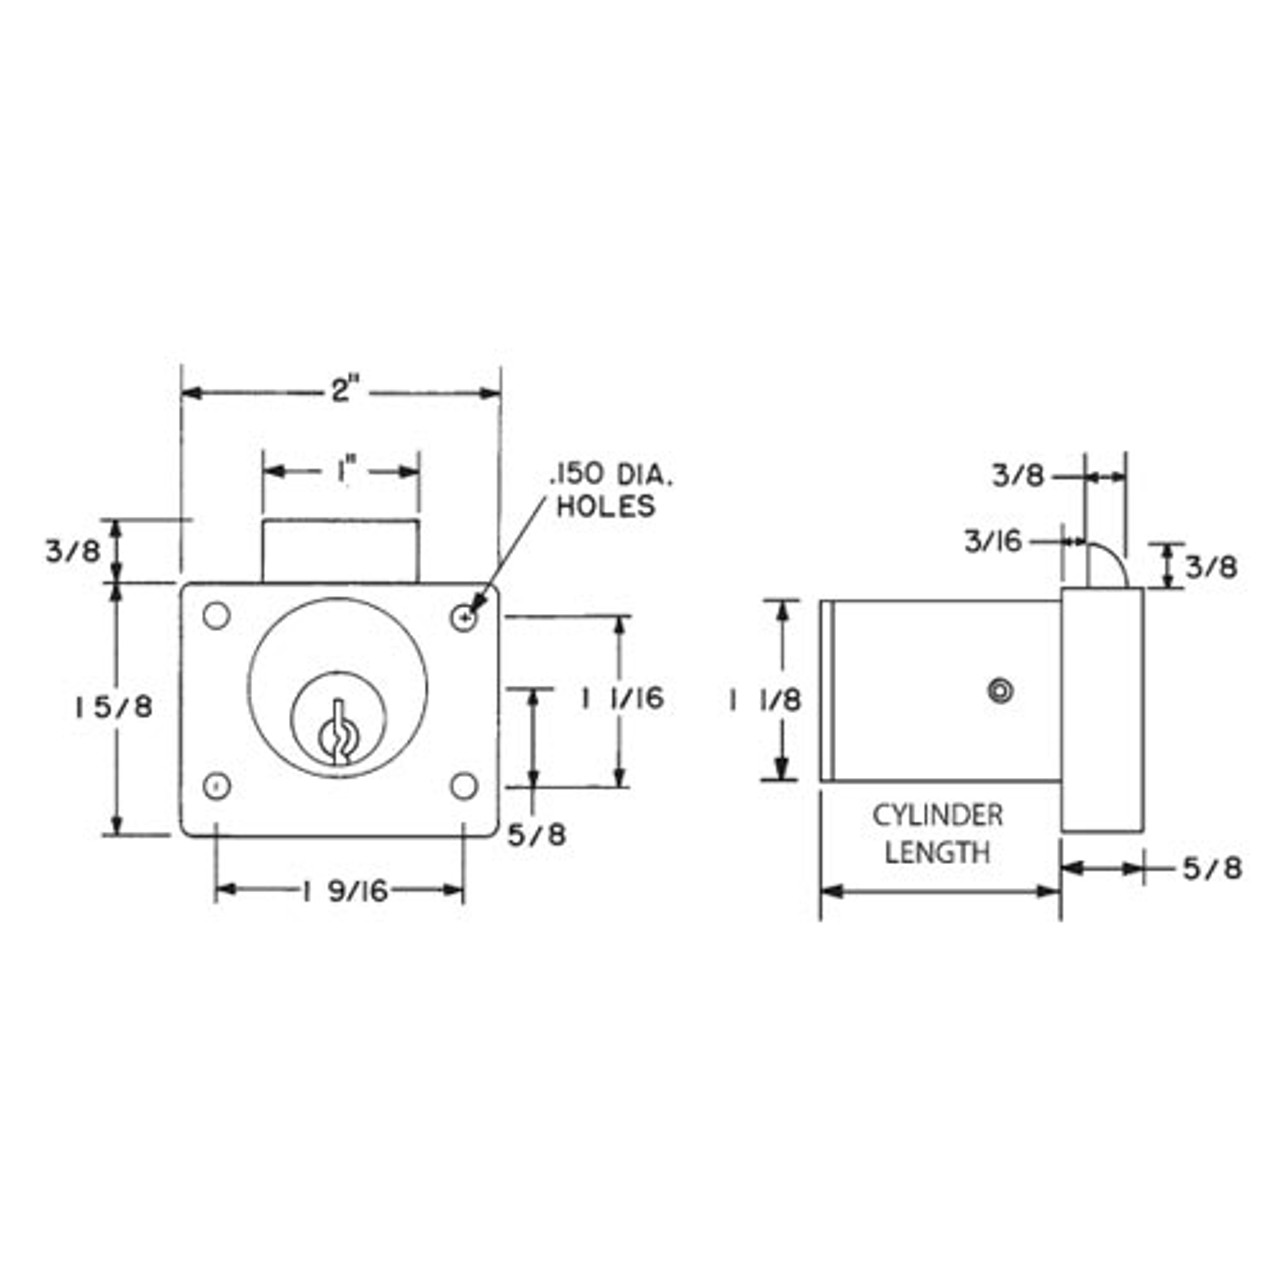 Olympus L78V-VH-KD-26D-1-1/8 Vertical Handing Drawer Latch Cabinet Lock in Satin Chrome